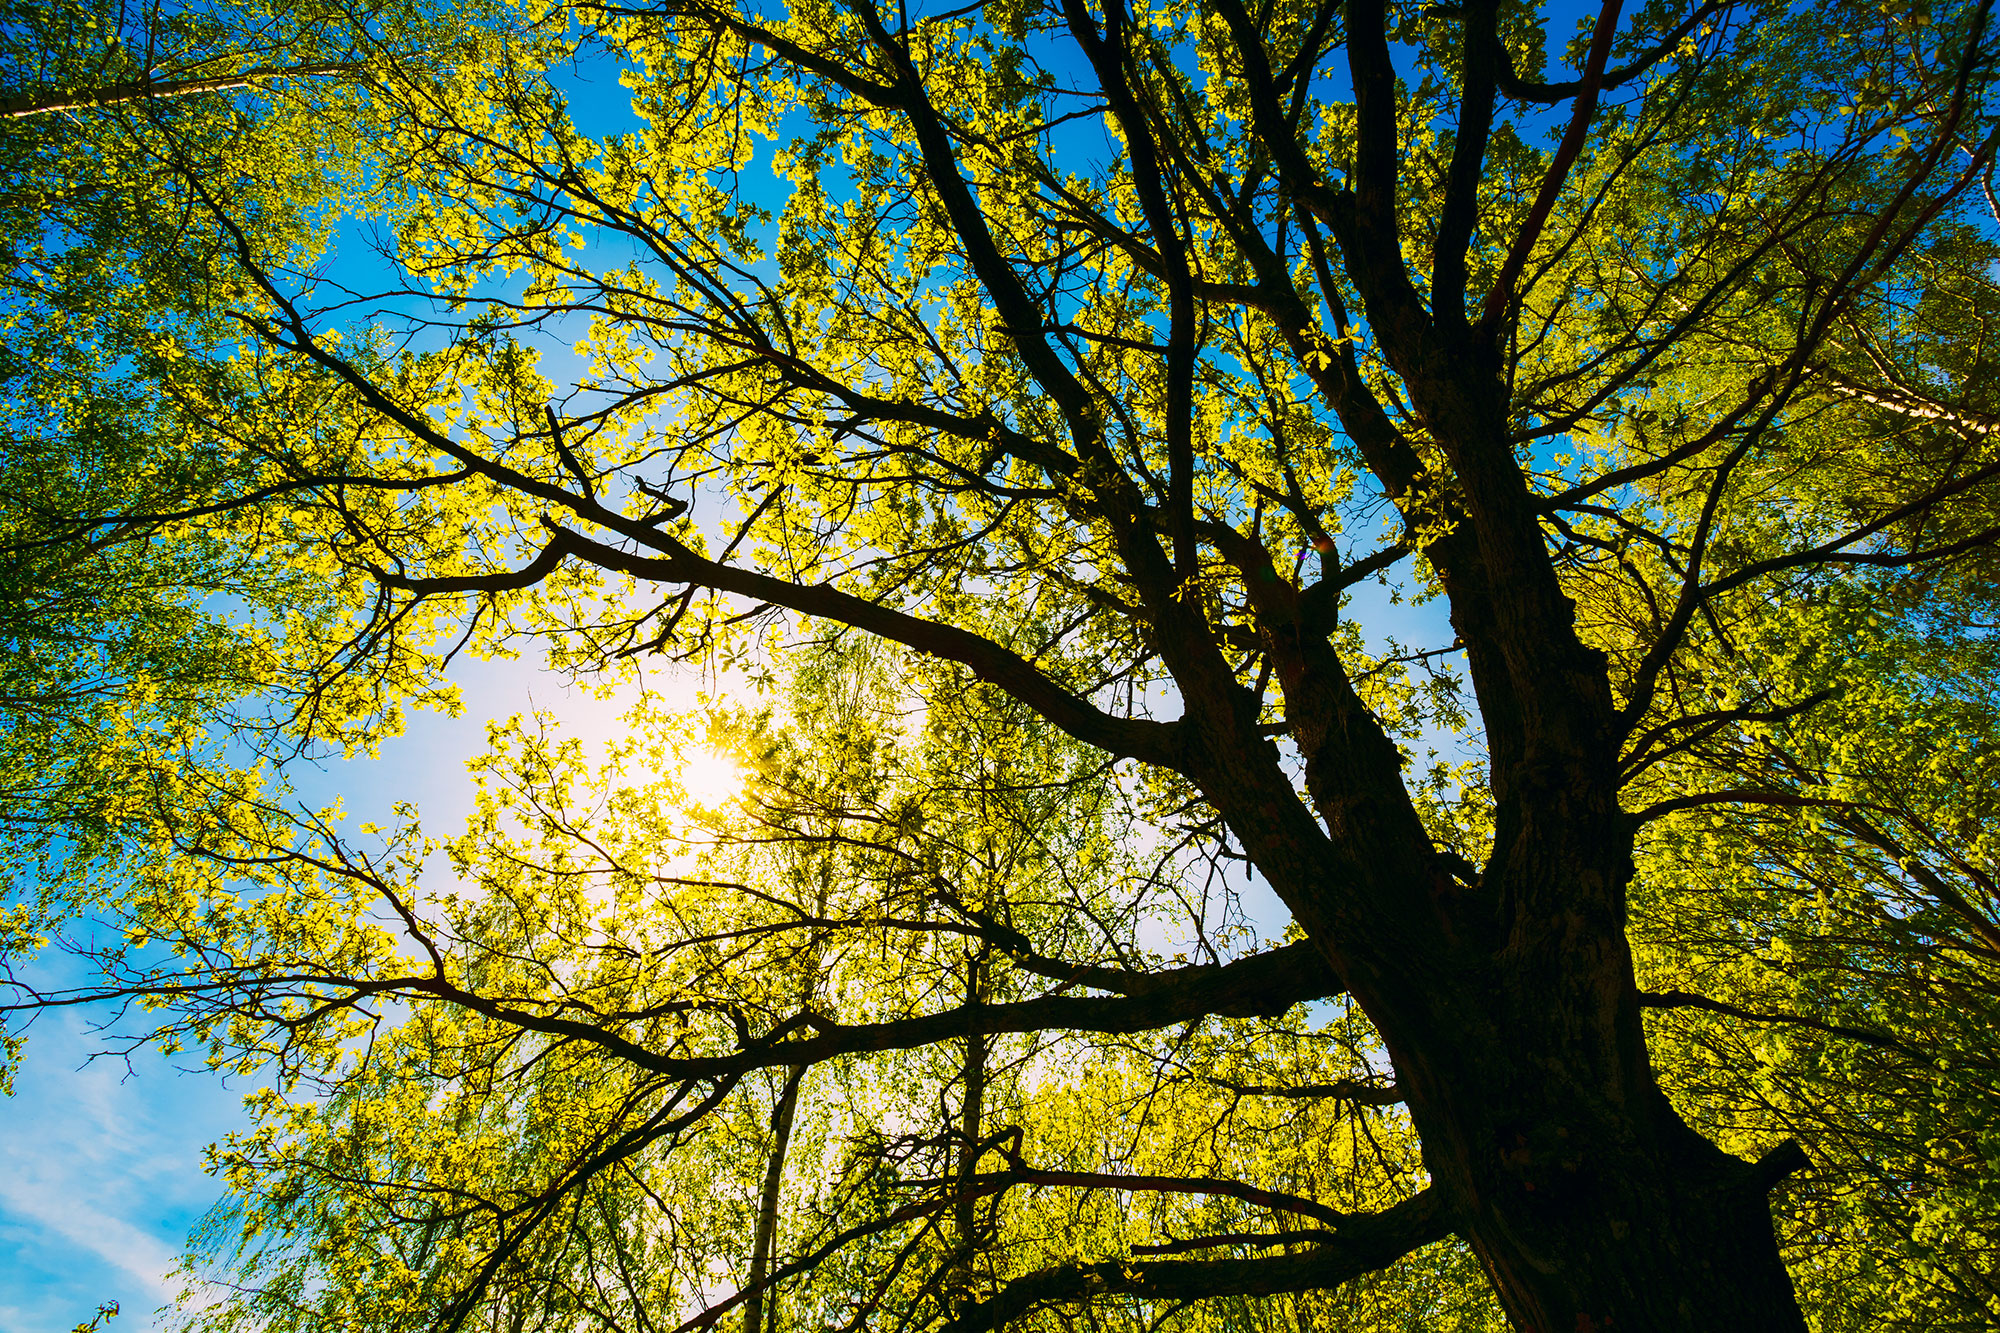 bigstock-Spring-Sun-Shining-Through-Can-86453774.jpg